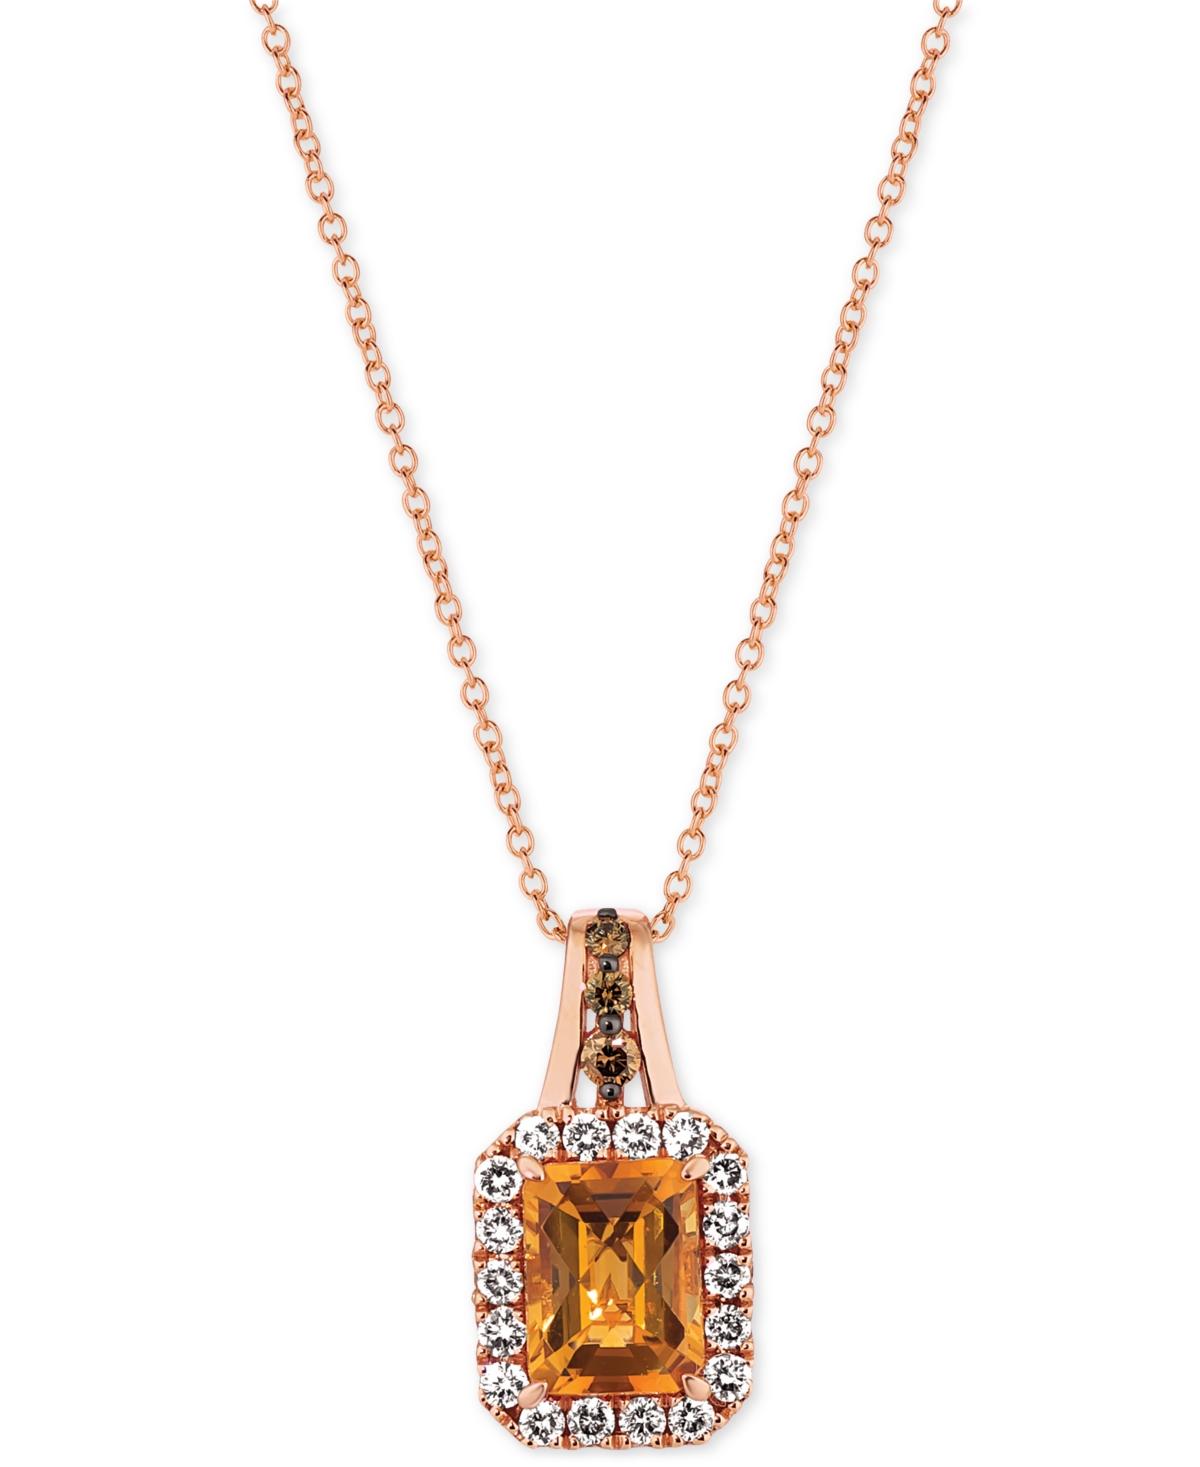 "Cinnamon Citrine (1-1/3 ct. t.w.) & Diamond (3/8 ct. t.w.) 18"" Pendant Necklace in 14k Rose Gold"